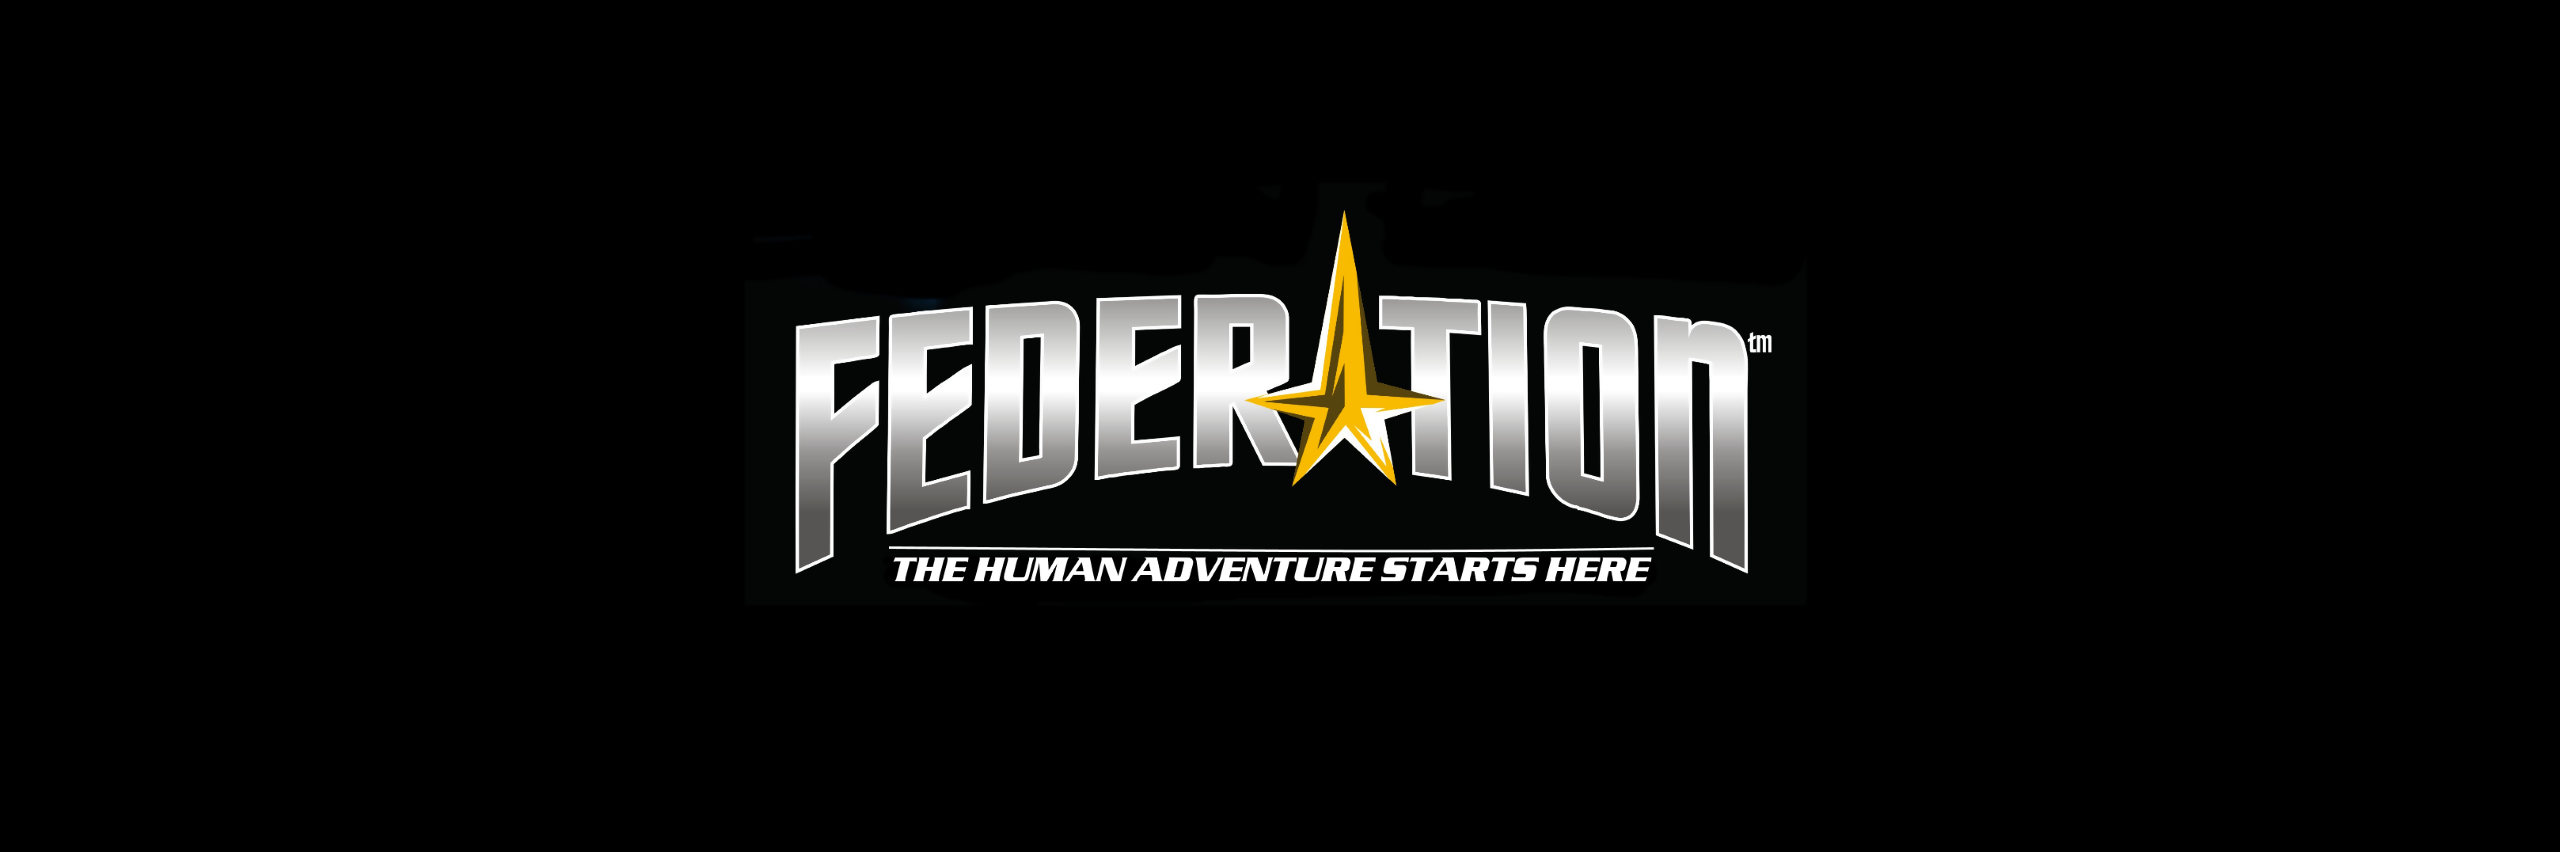 Federation TV